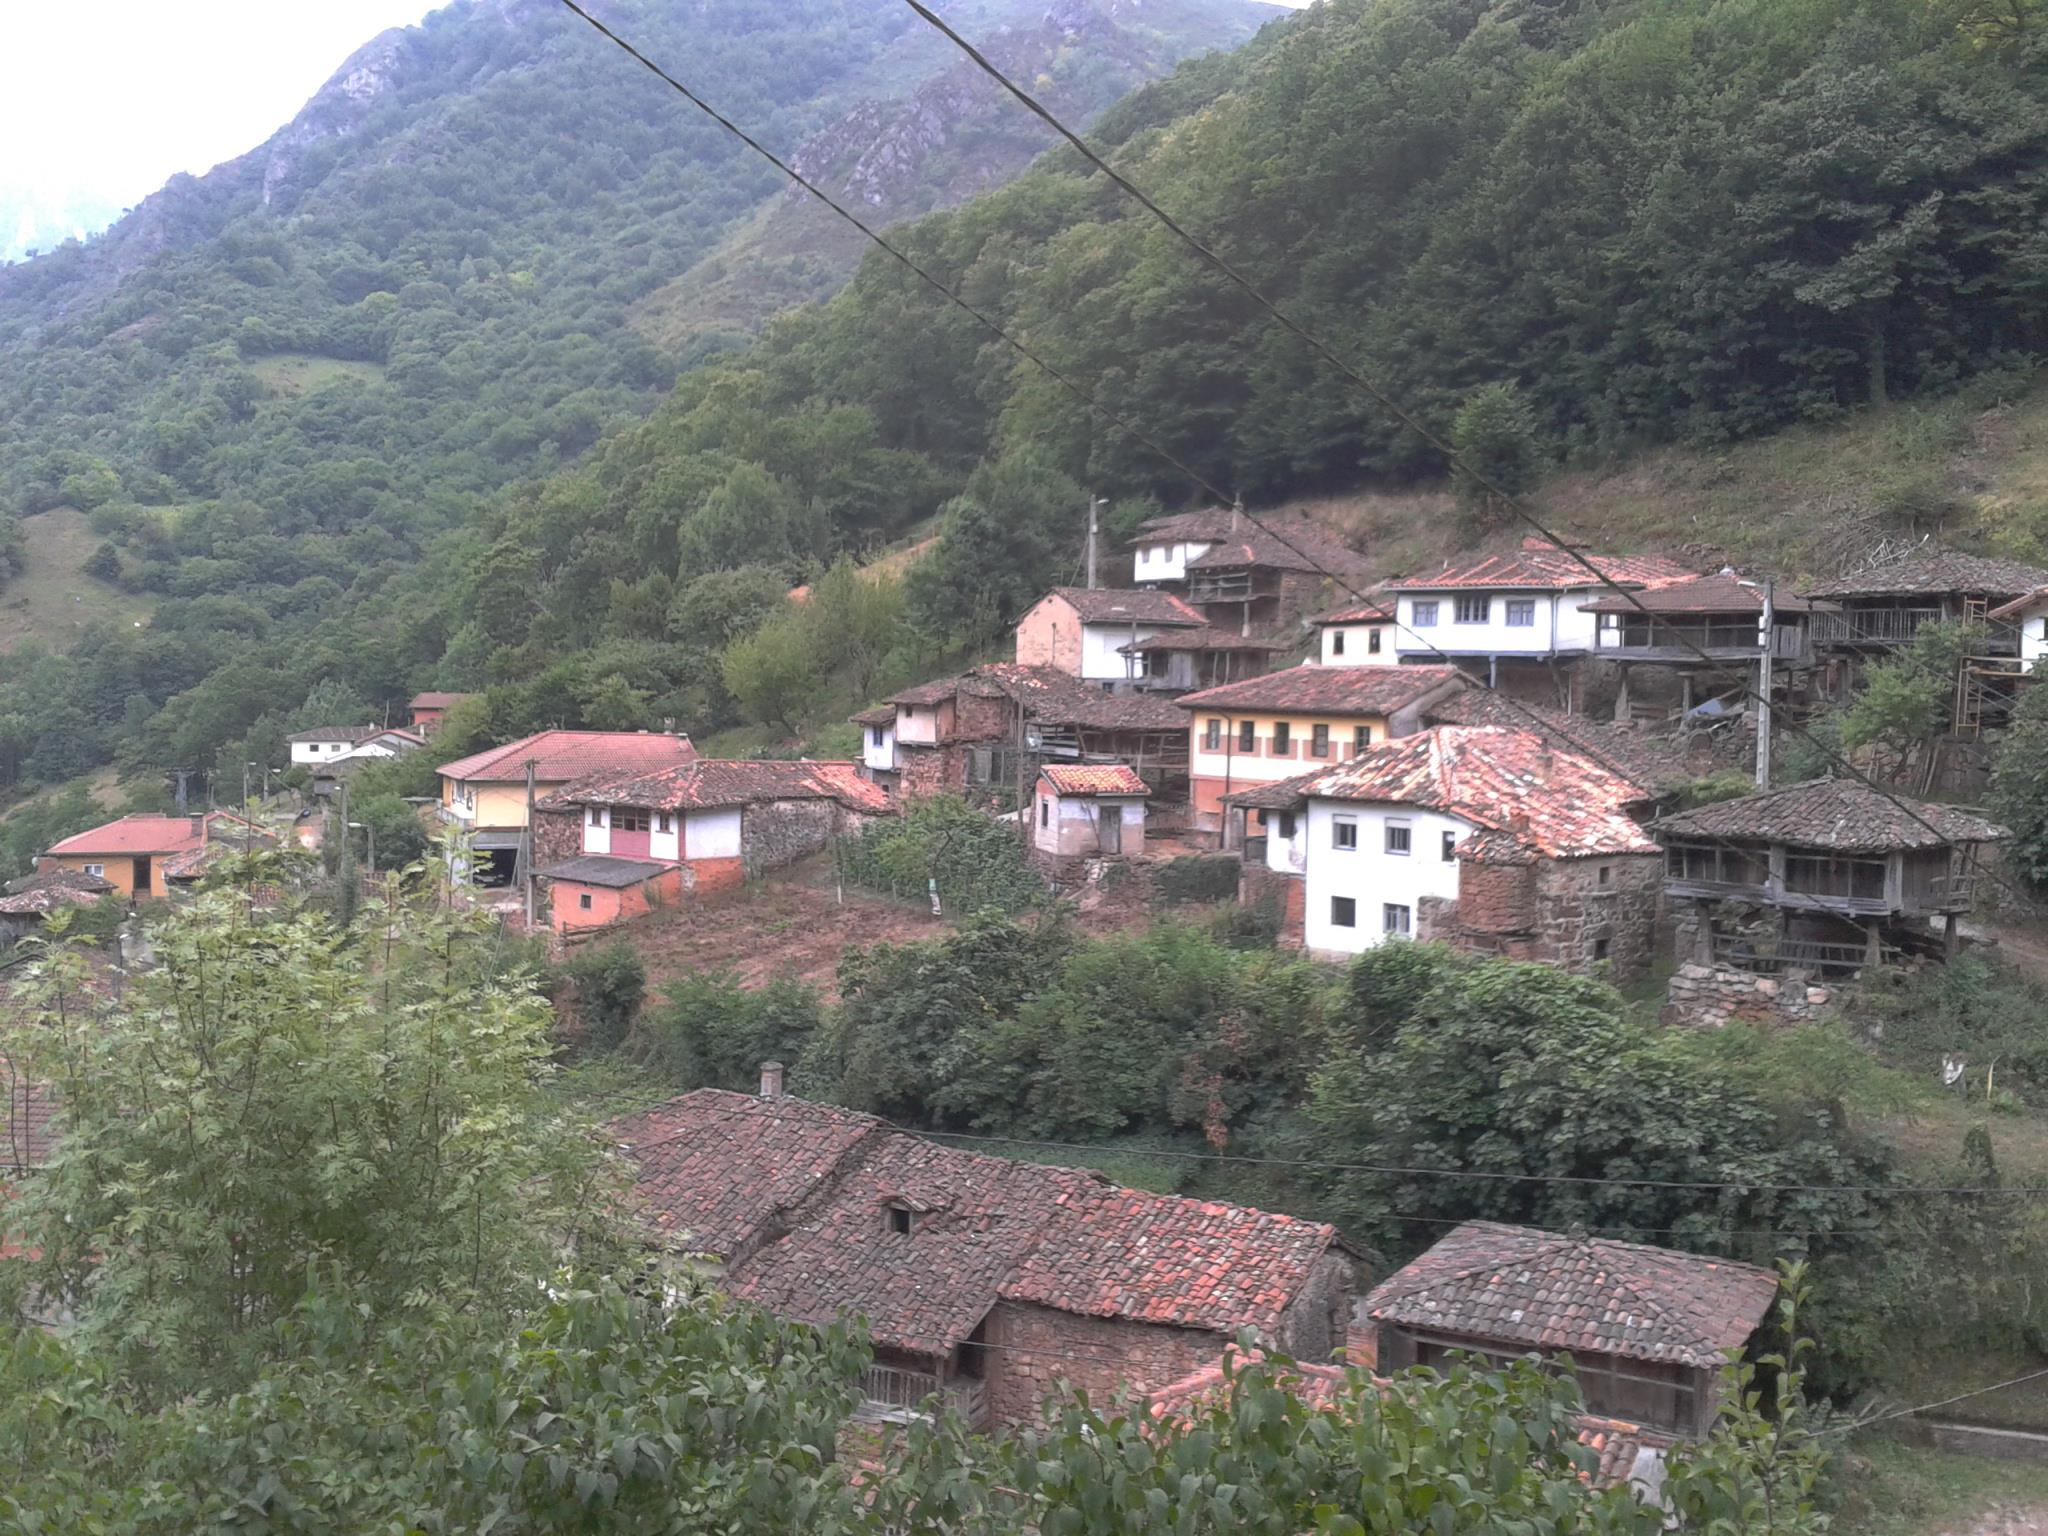 Cuevas (Belmonte)